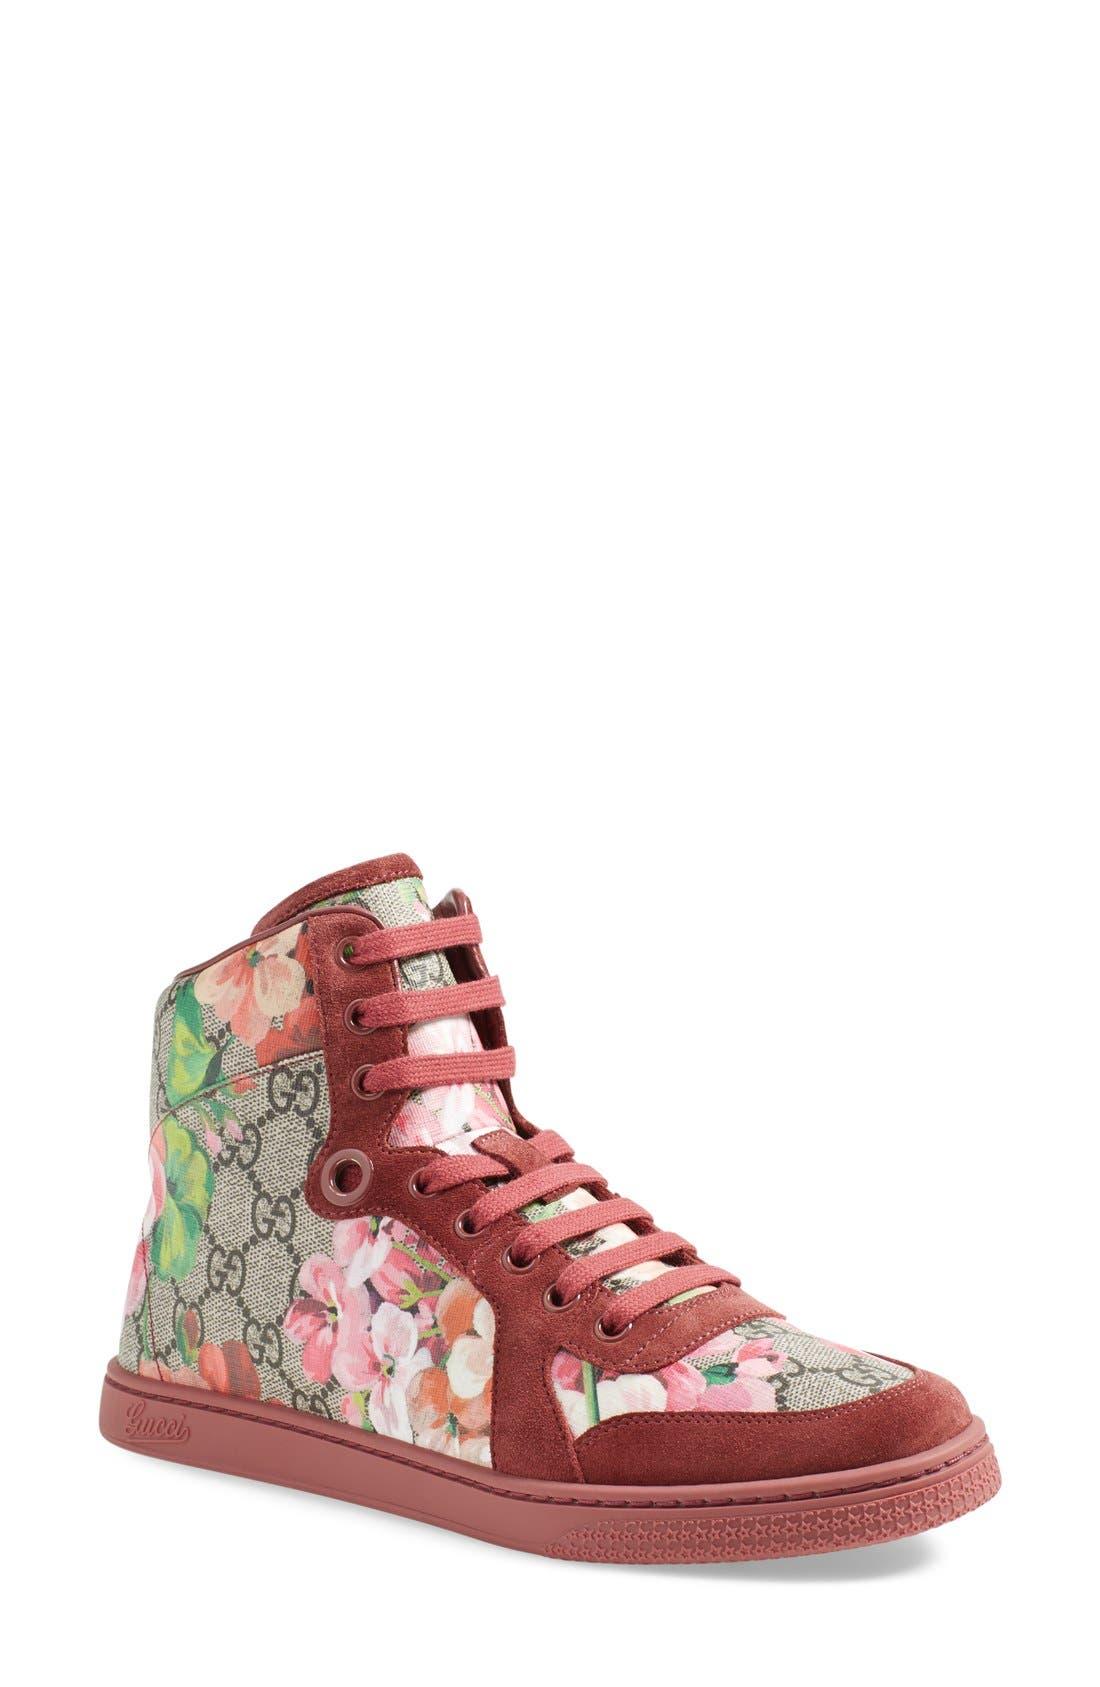 Gucci 'Coda - Bloom' High Top Sneaker